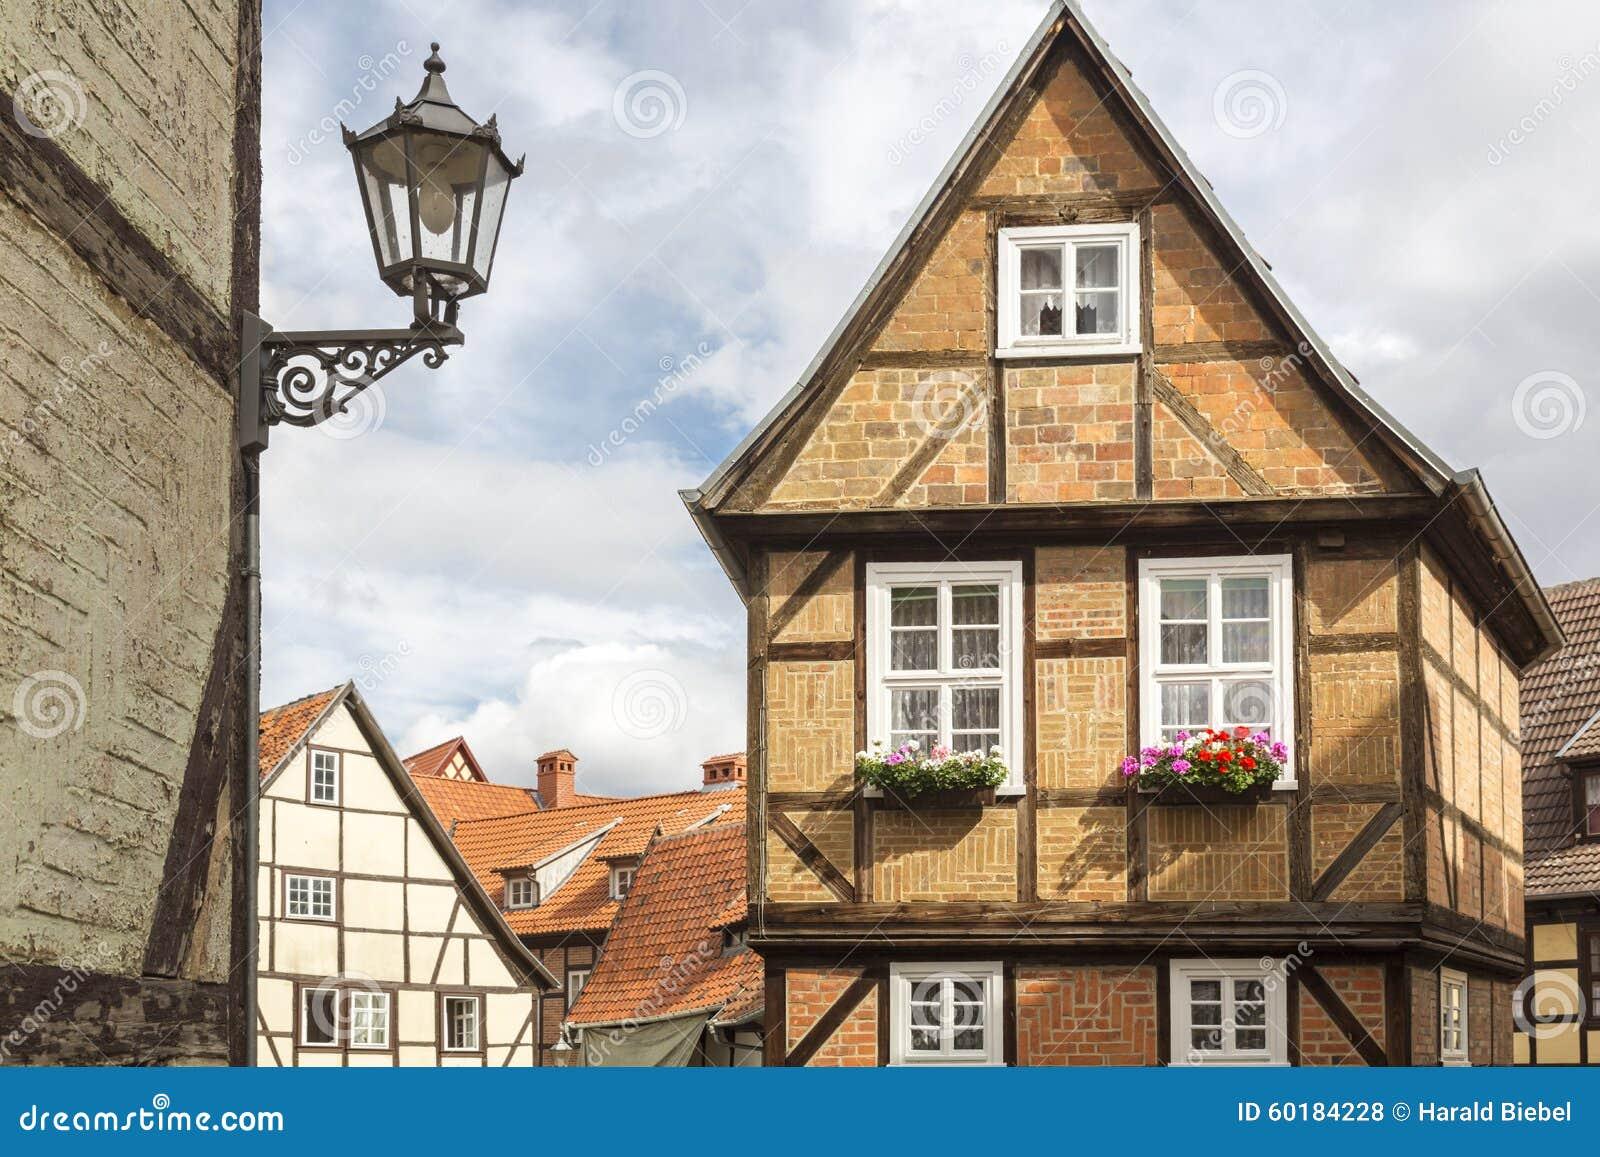 half timbered house in quedlinburg germany stock photo image of landmark city 60184228. Black Bedroom Furniture Sets. Home Design Ideas